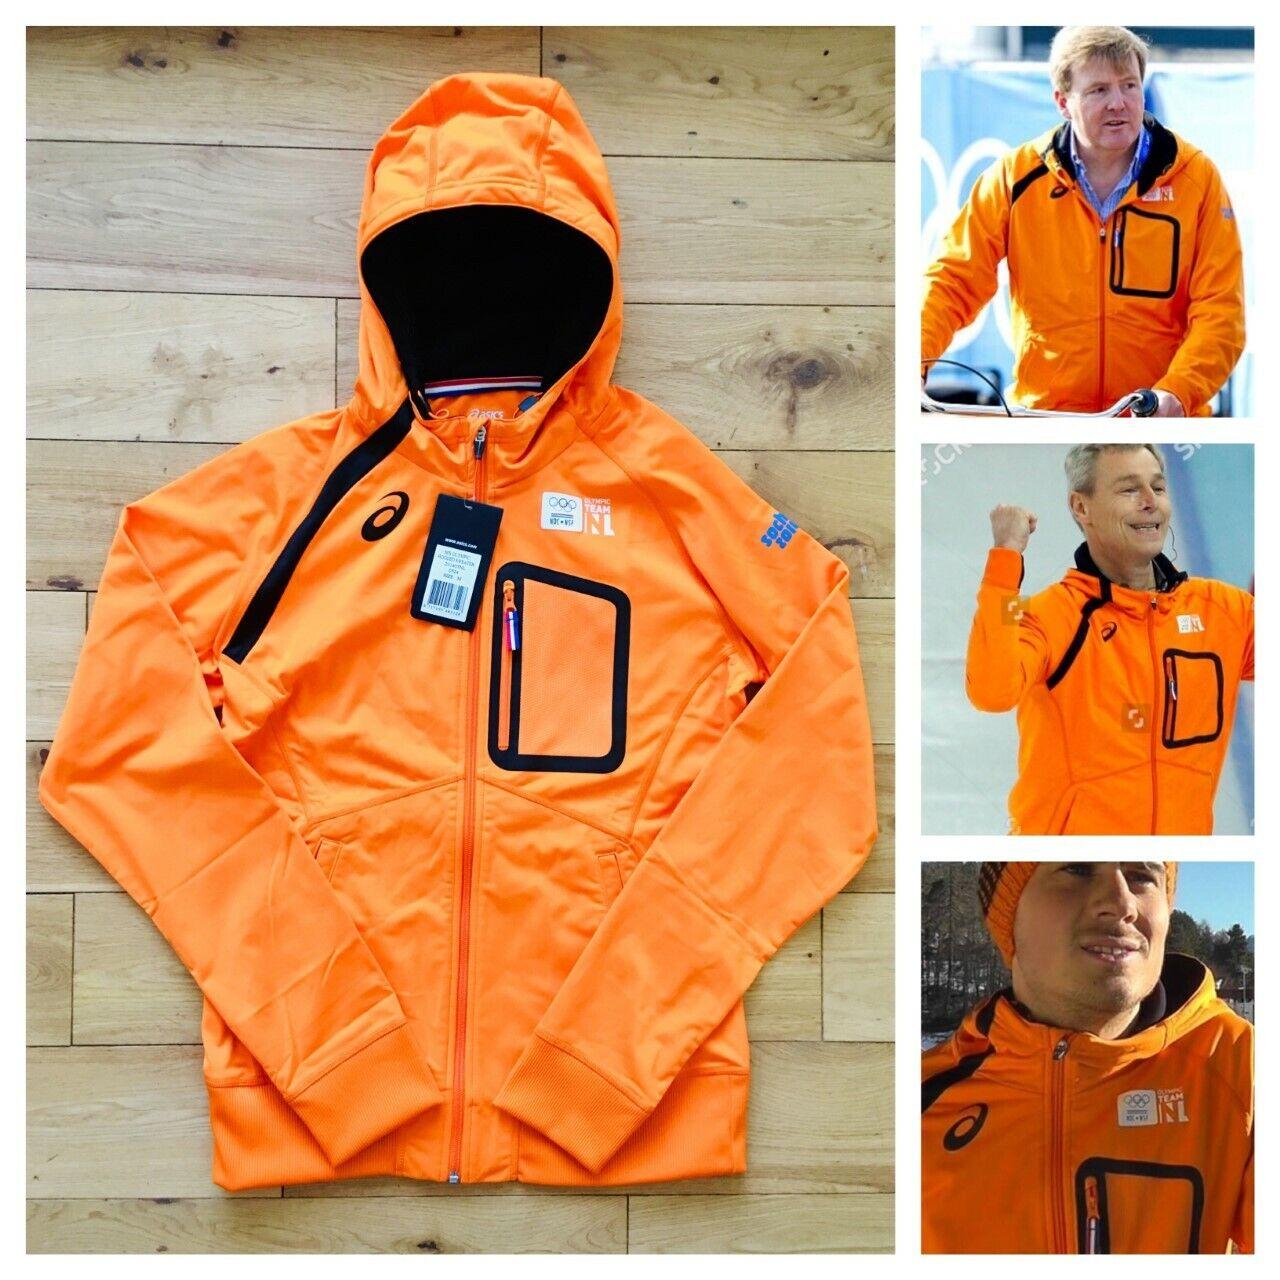 Asics Netherlands Pro Elite Sochi 2014 Olympics Men's Hooded Jacket New Size M